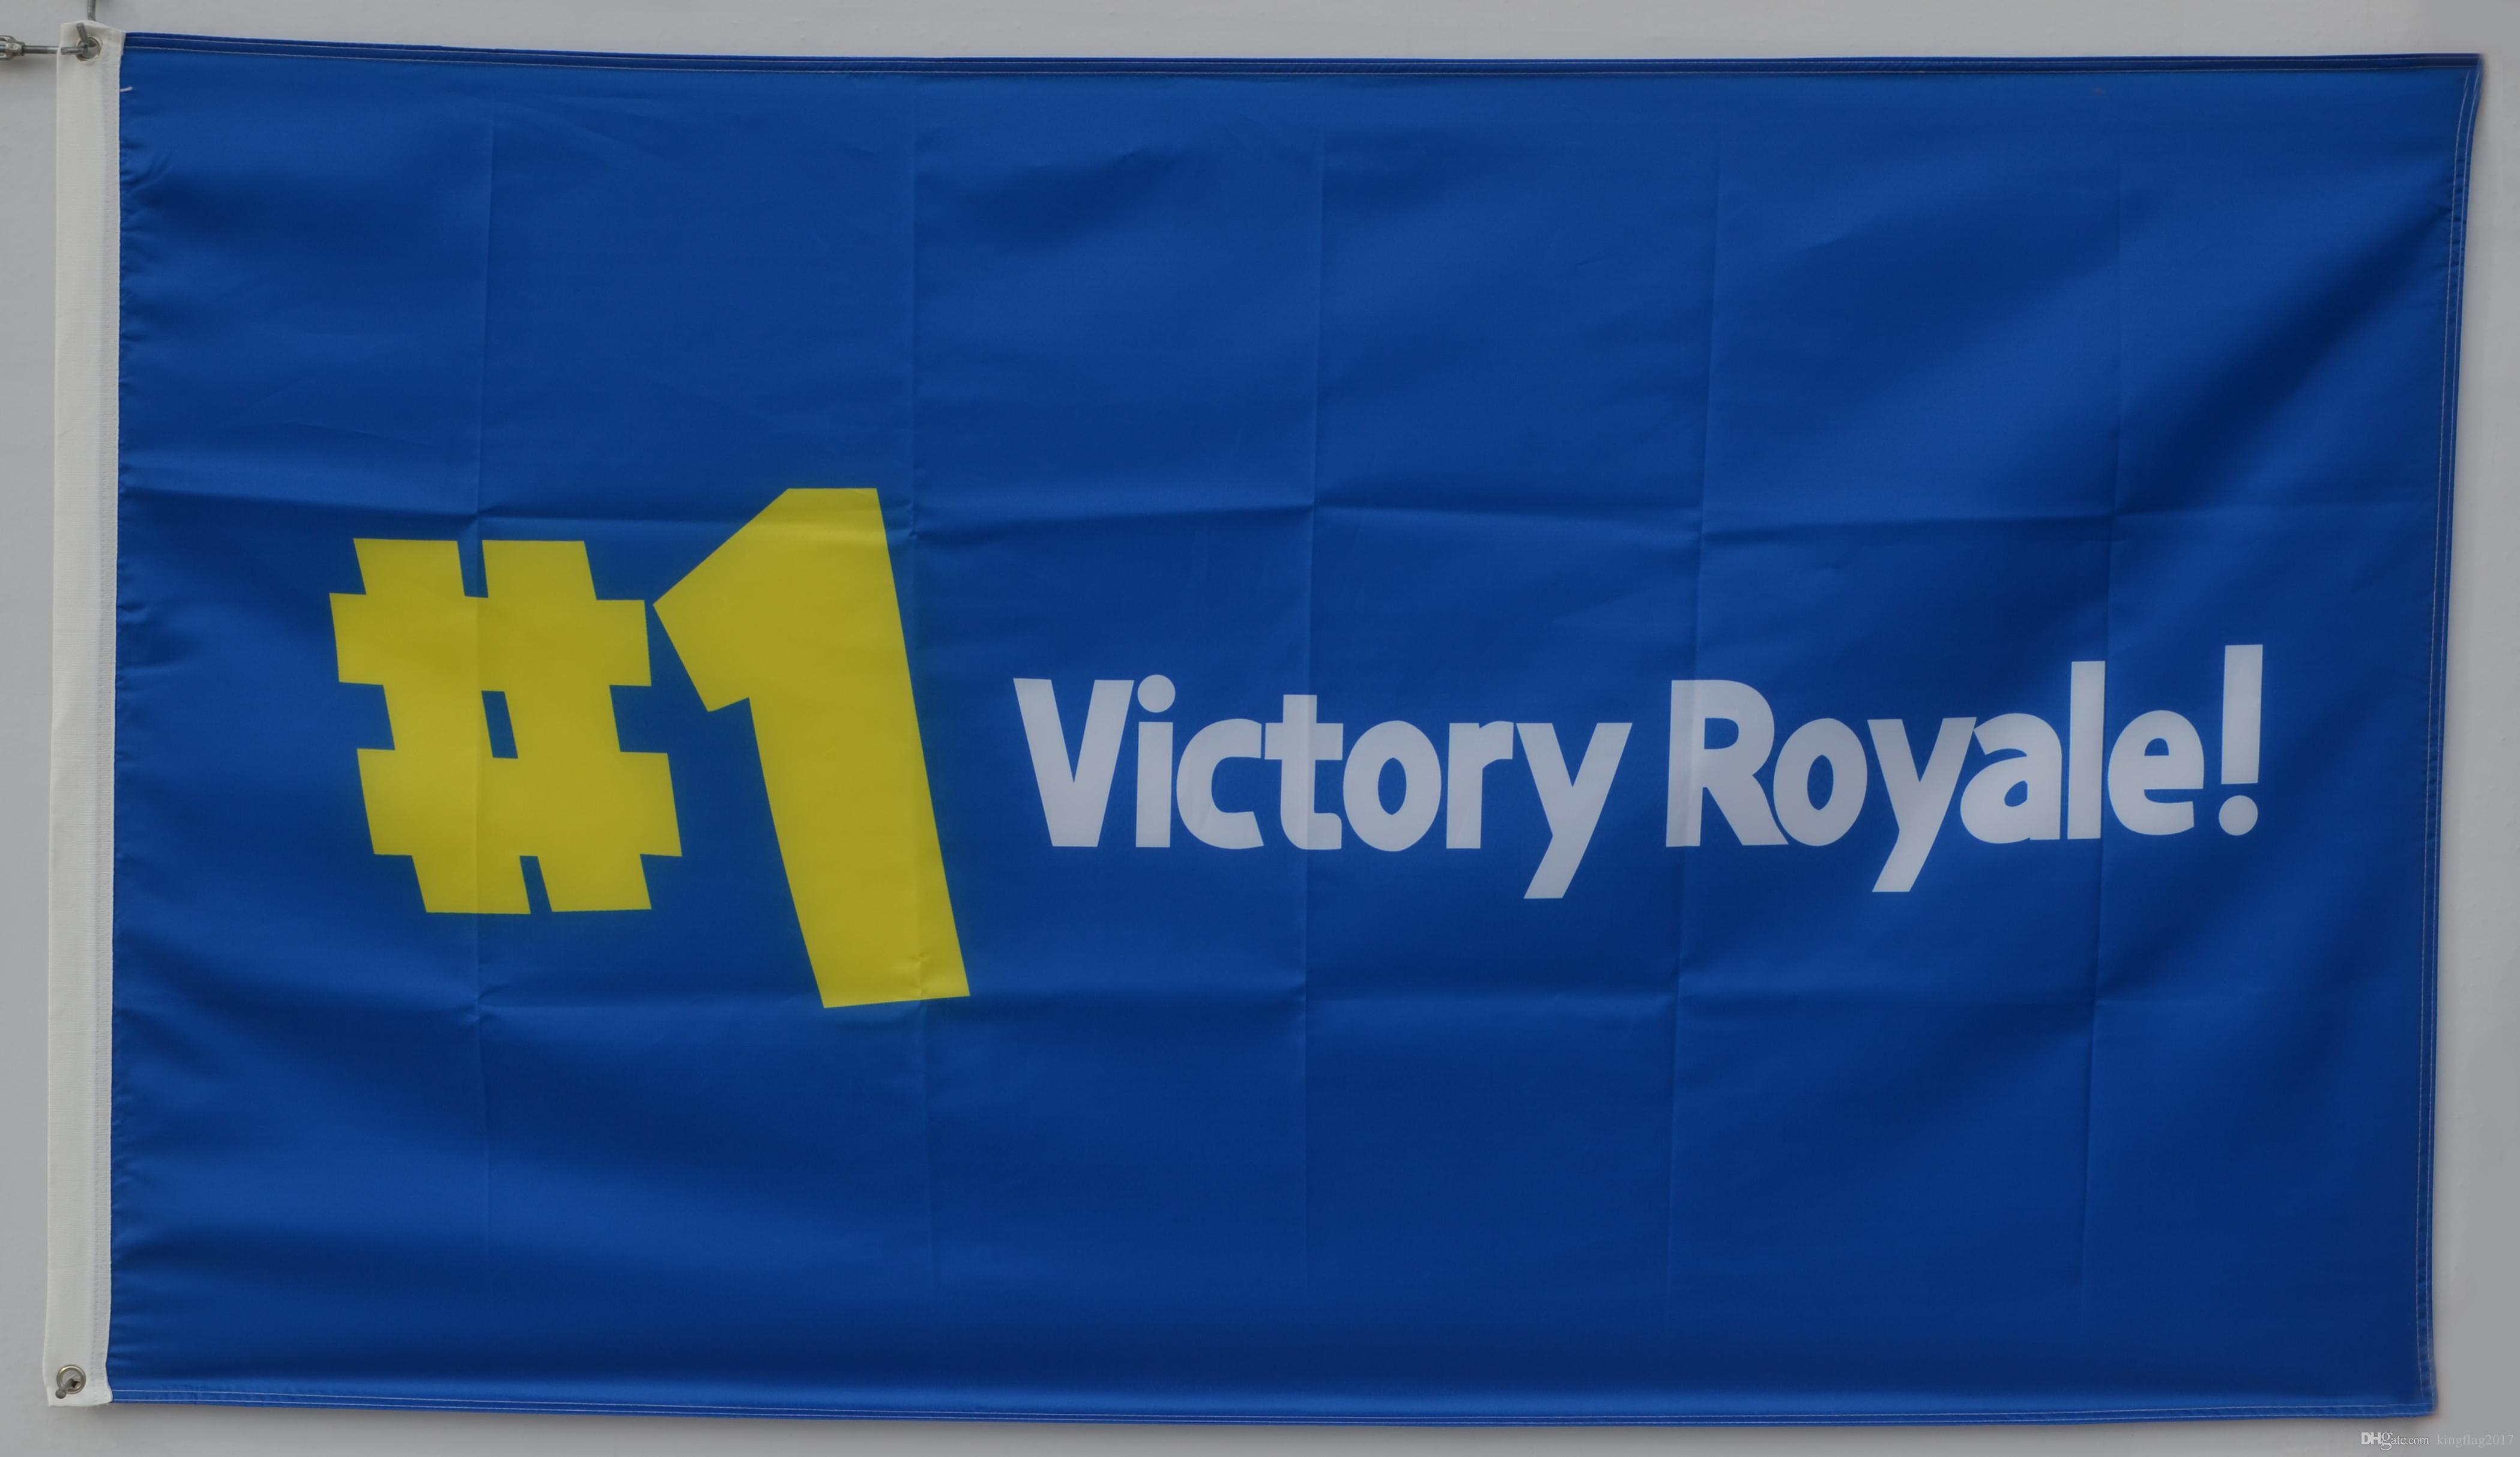 91d84c6181 Compre Fortnite 1 Victory Royale Video Game Bandeira De Batalha Logotipo  Banner De Kingflag2017